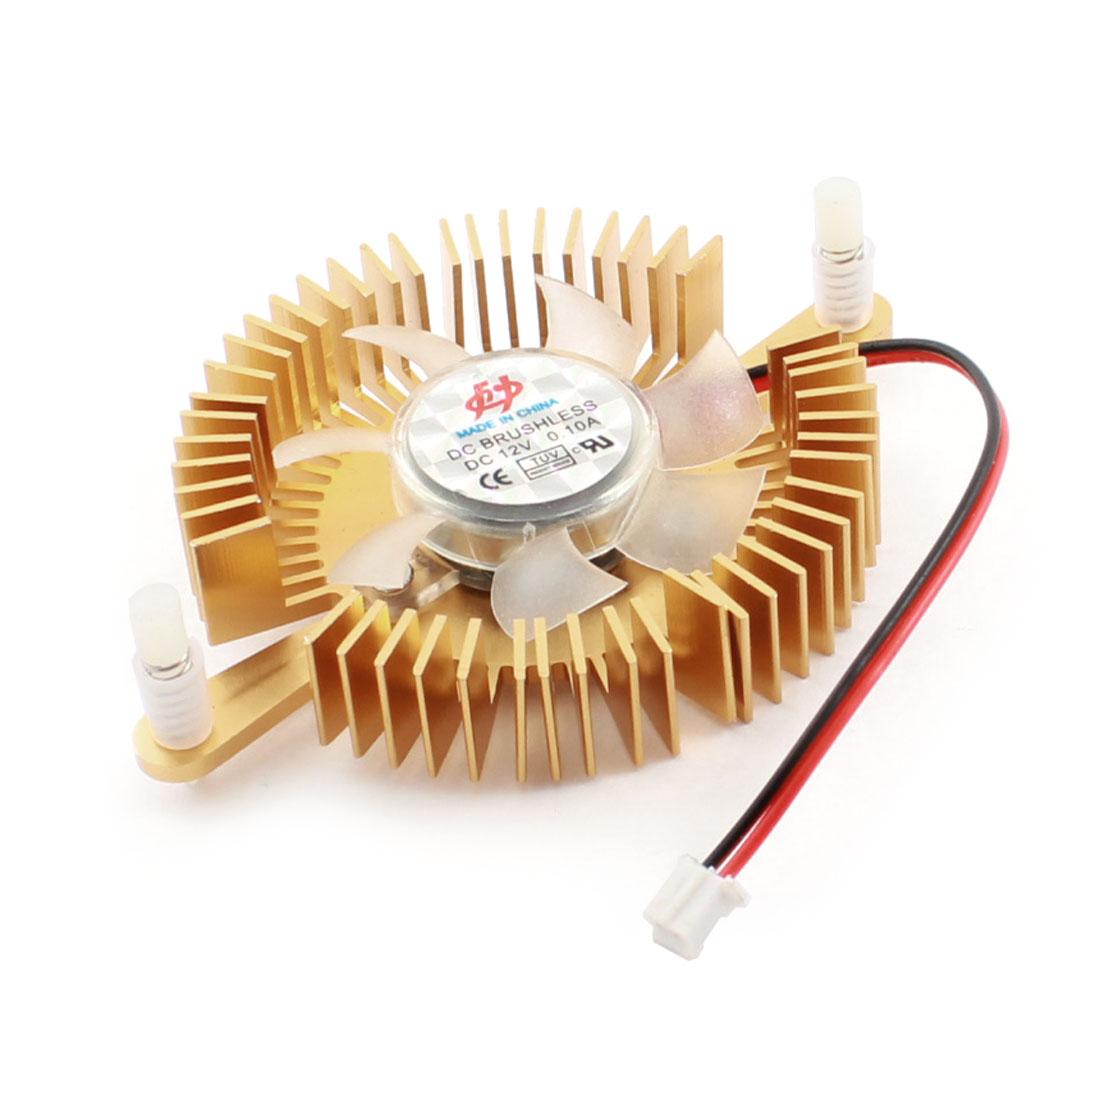 DC 12V 2 Pin JST-XH Plug Connector Aluminum Cooling Fan Cooler Heatsink for PC Computer Video Card